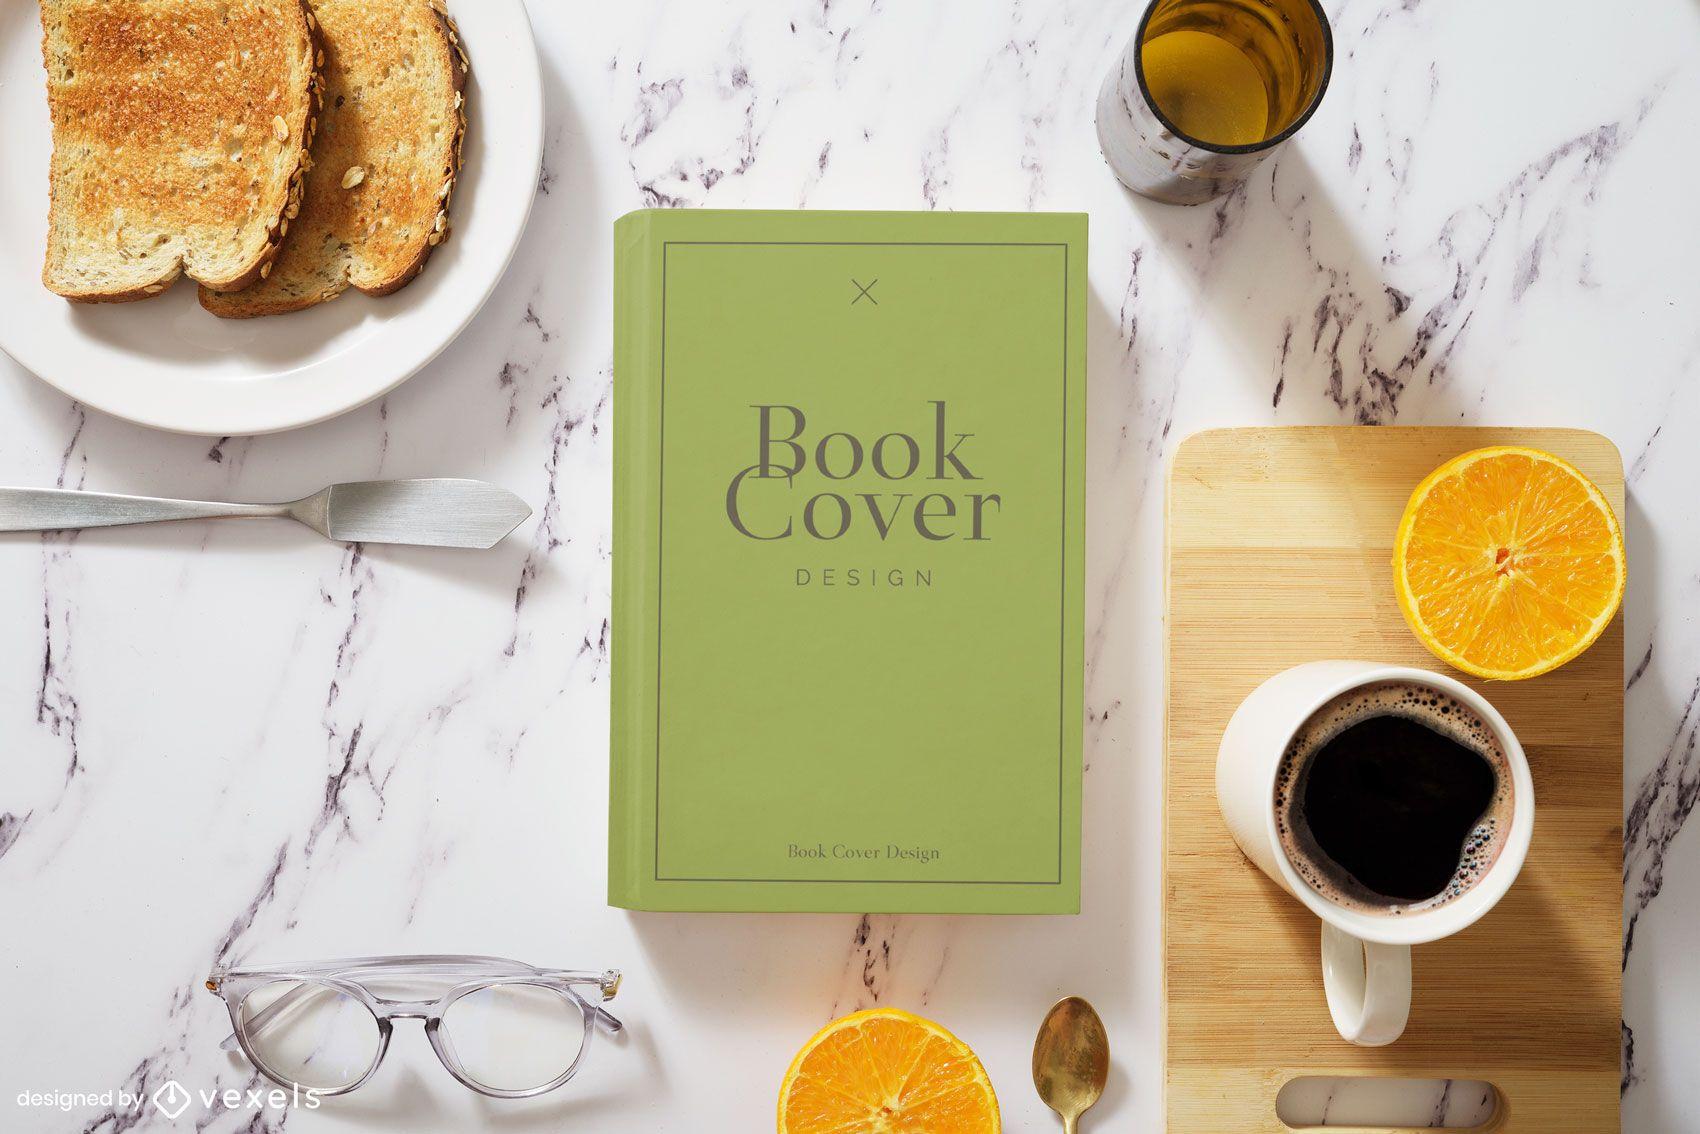 Composición de maqueta de desayuno de portada de libro